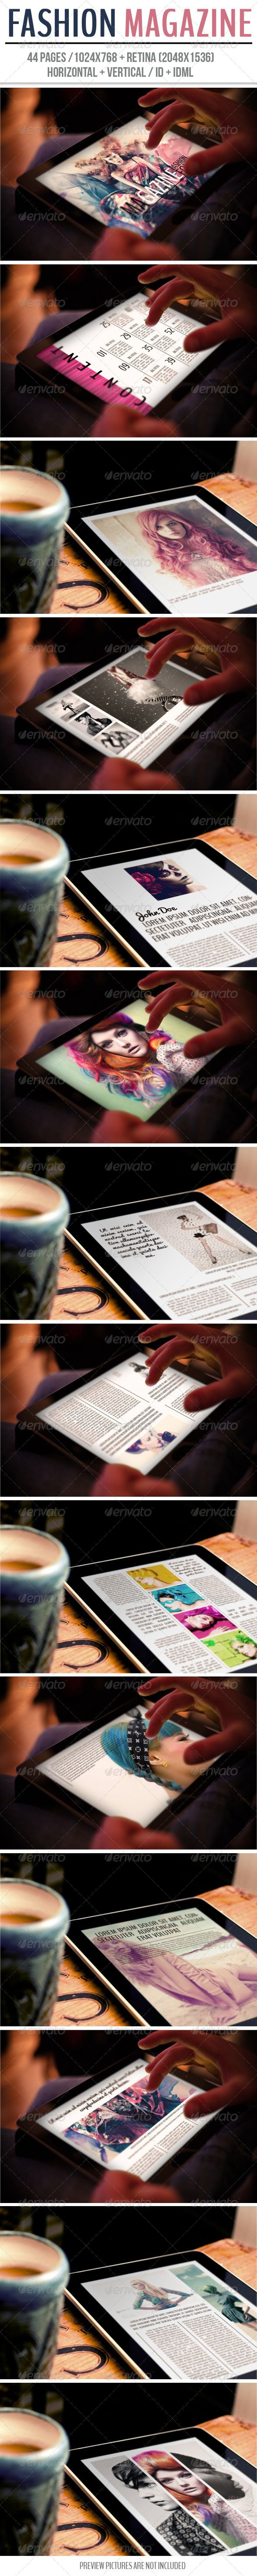 iPad & Tablet Fashion Magazine Template #design Download: http://graphicriver.net/item/ipad-tablet-fashion-magazine/6652226?ref=ksioks